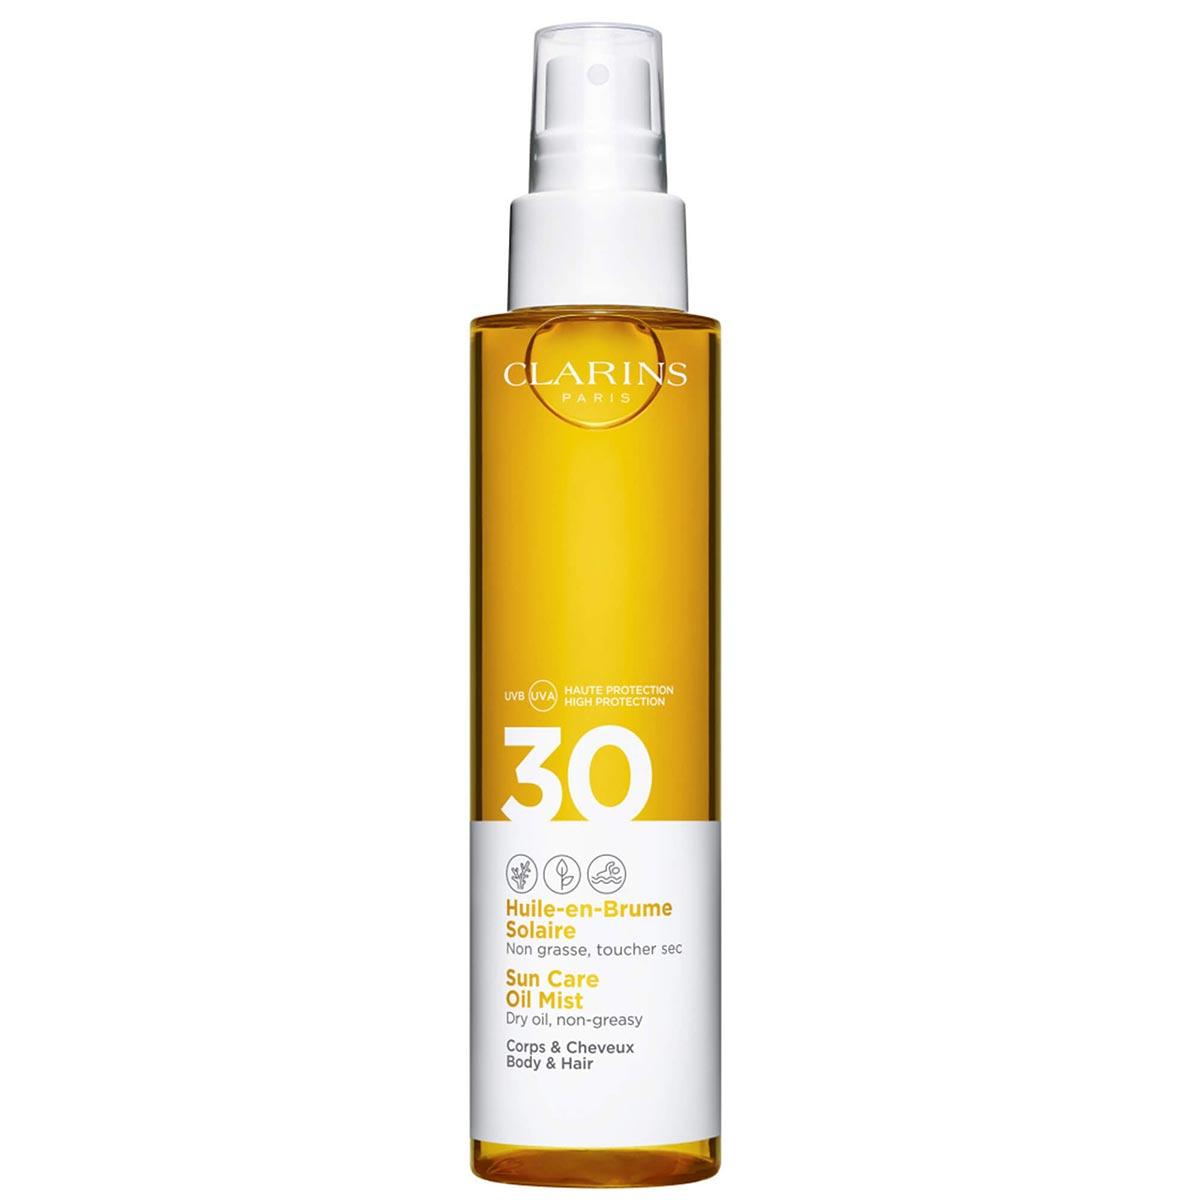 Clarins - Huile-en-Brume Solaire Corps et Cheveux - UVA/UVB30 150 ml